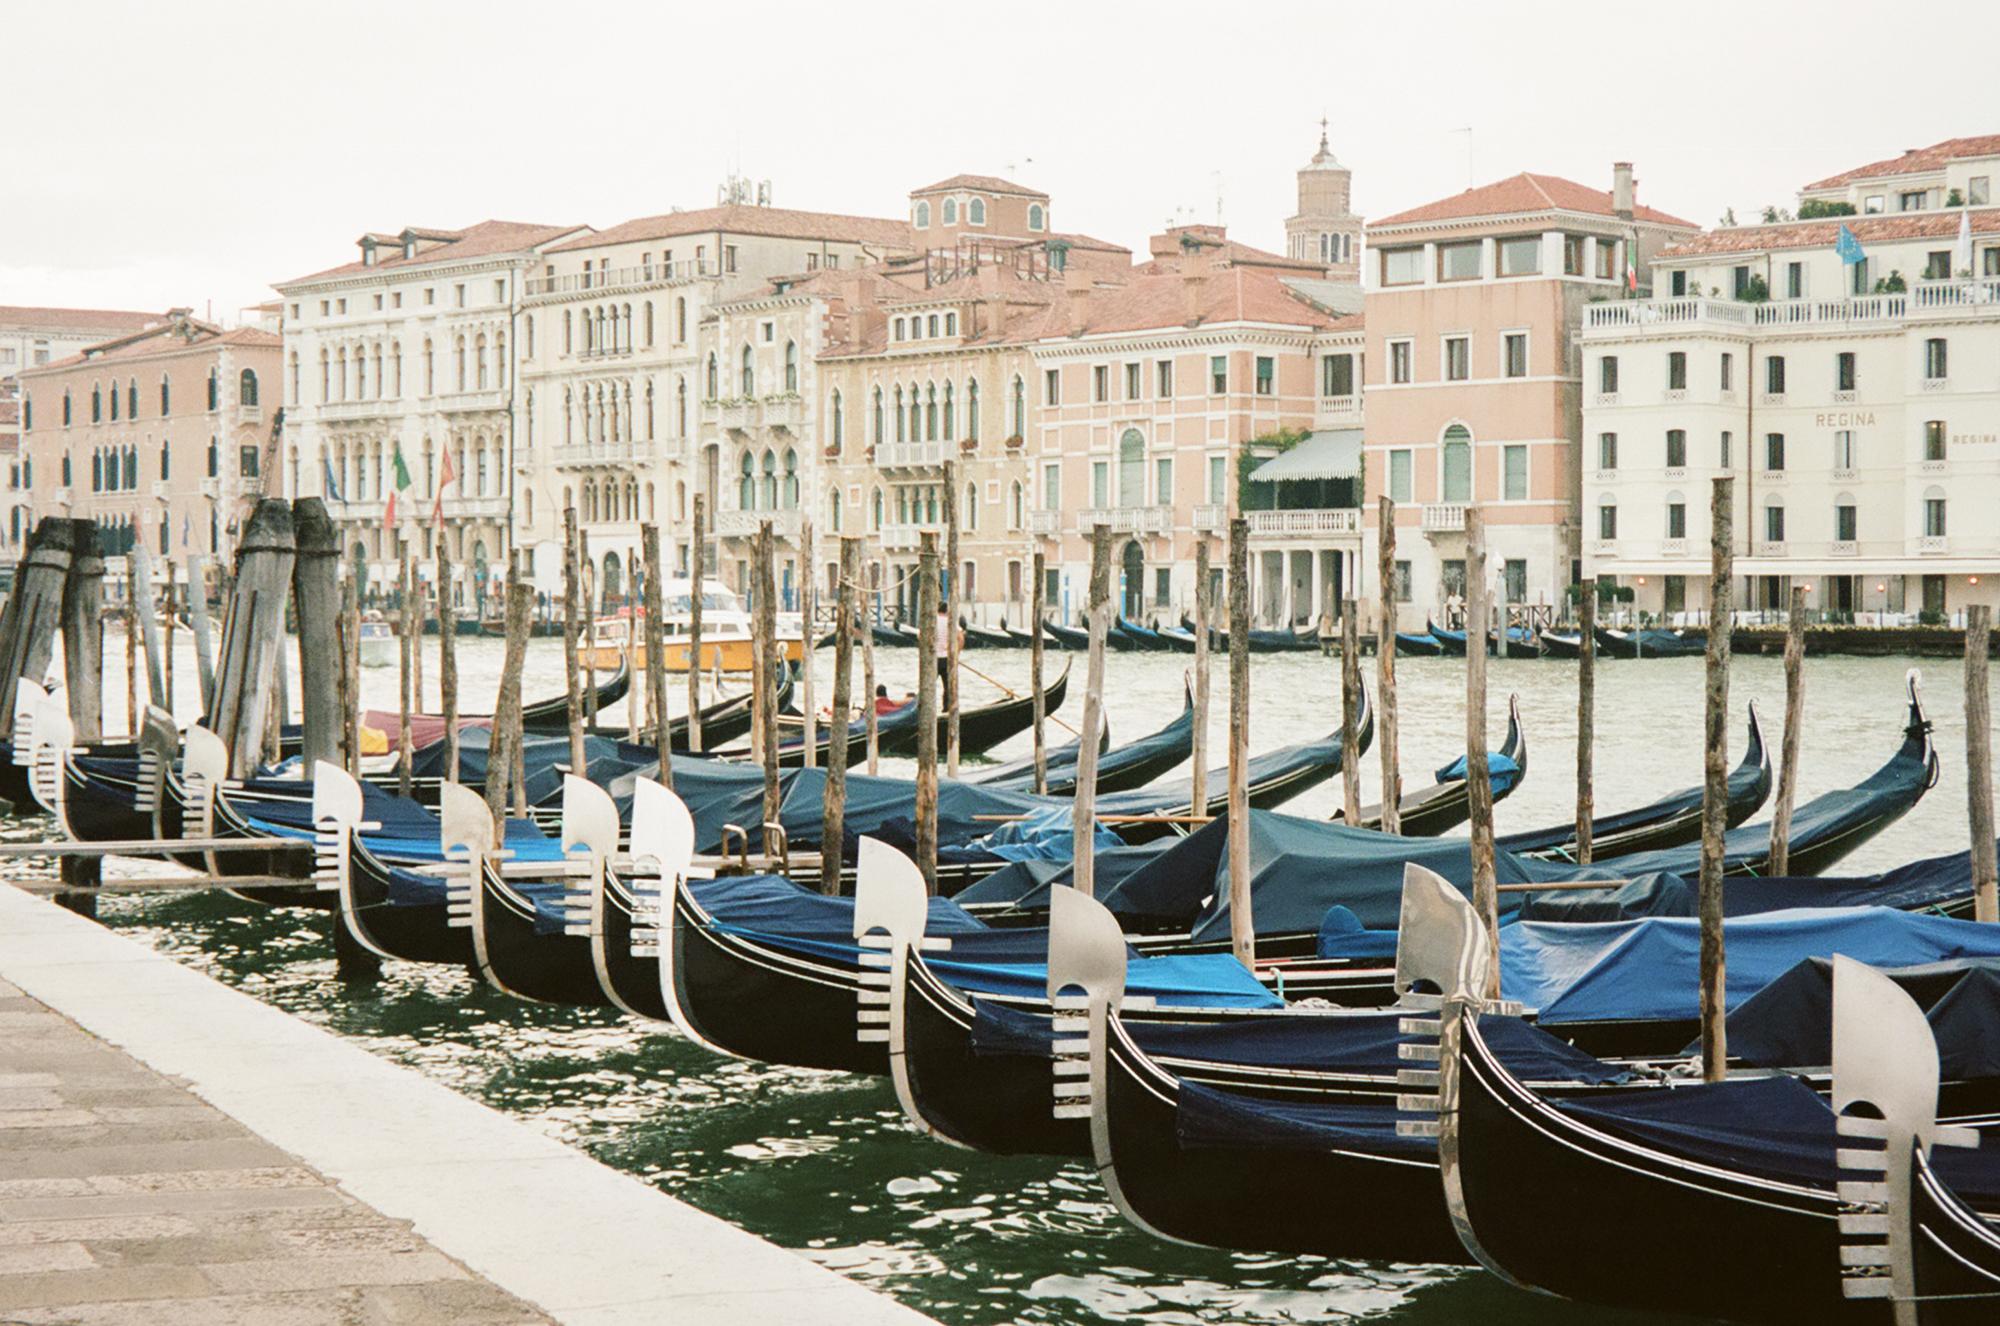 Carin_Olsson_Venice_Film_12.jpg